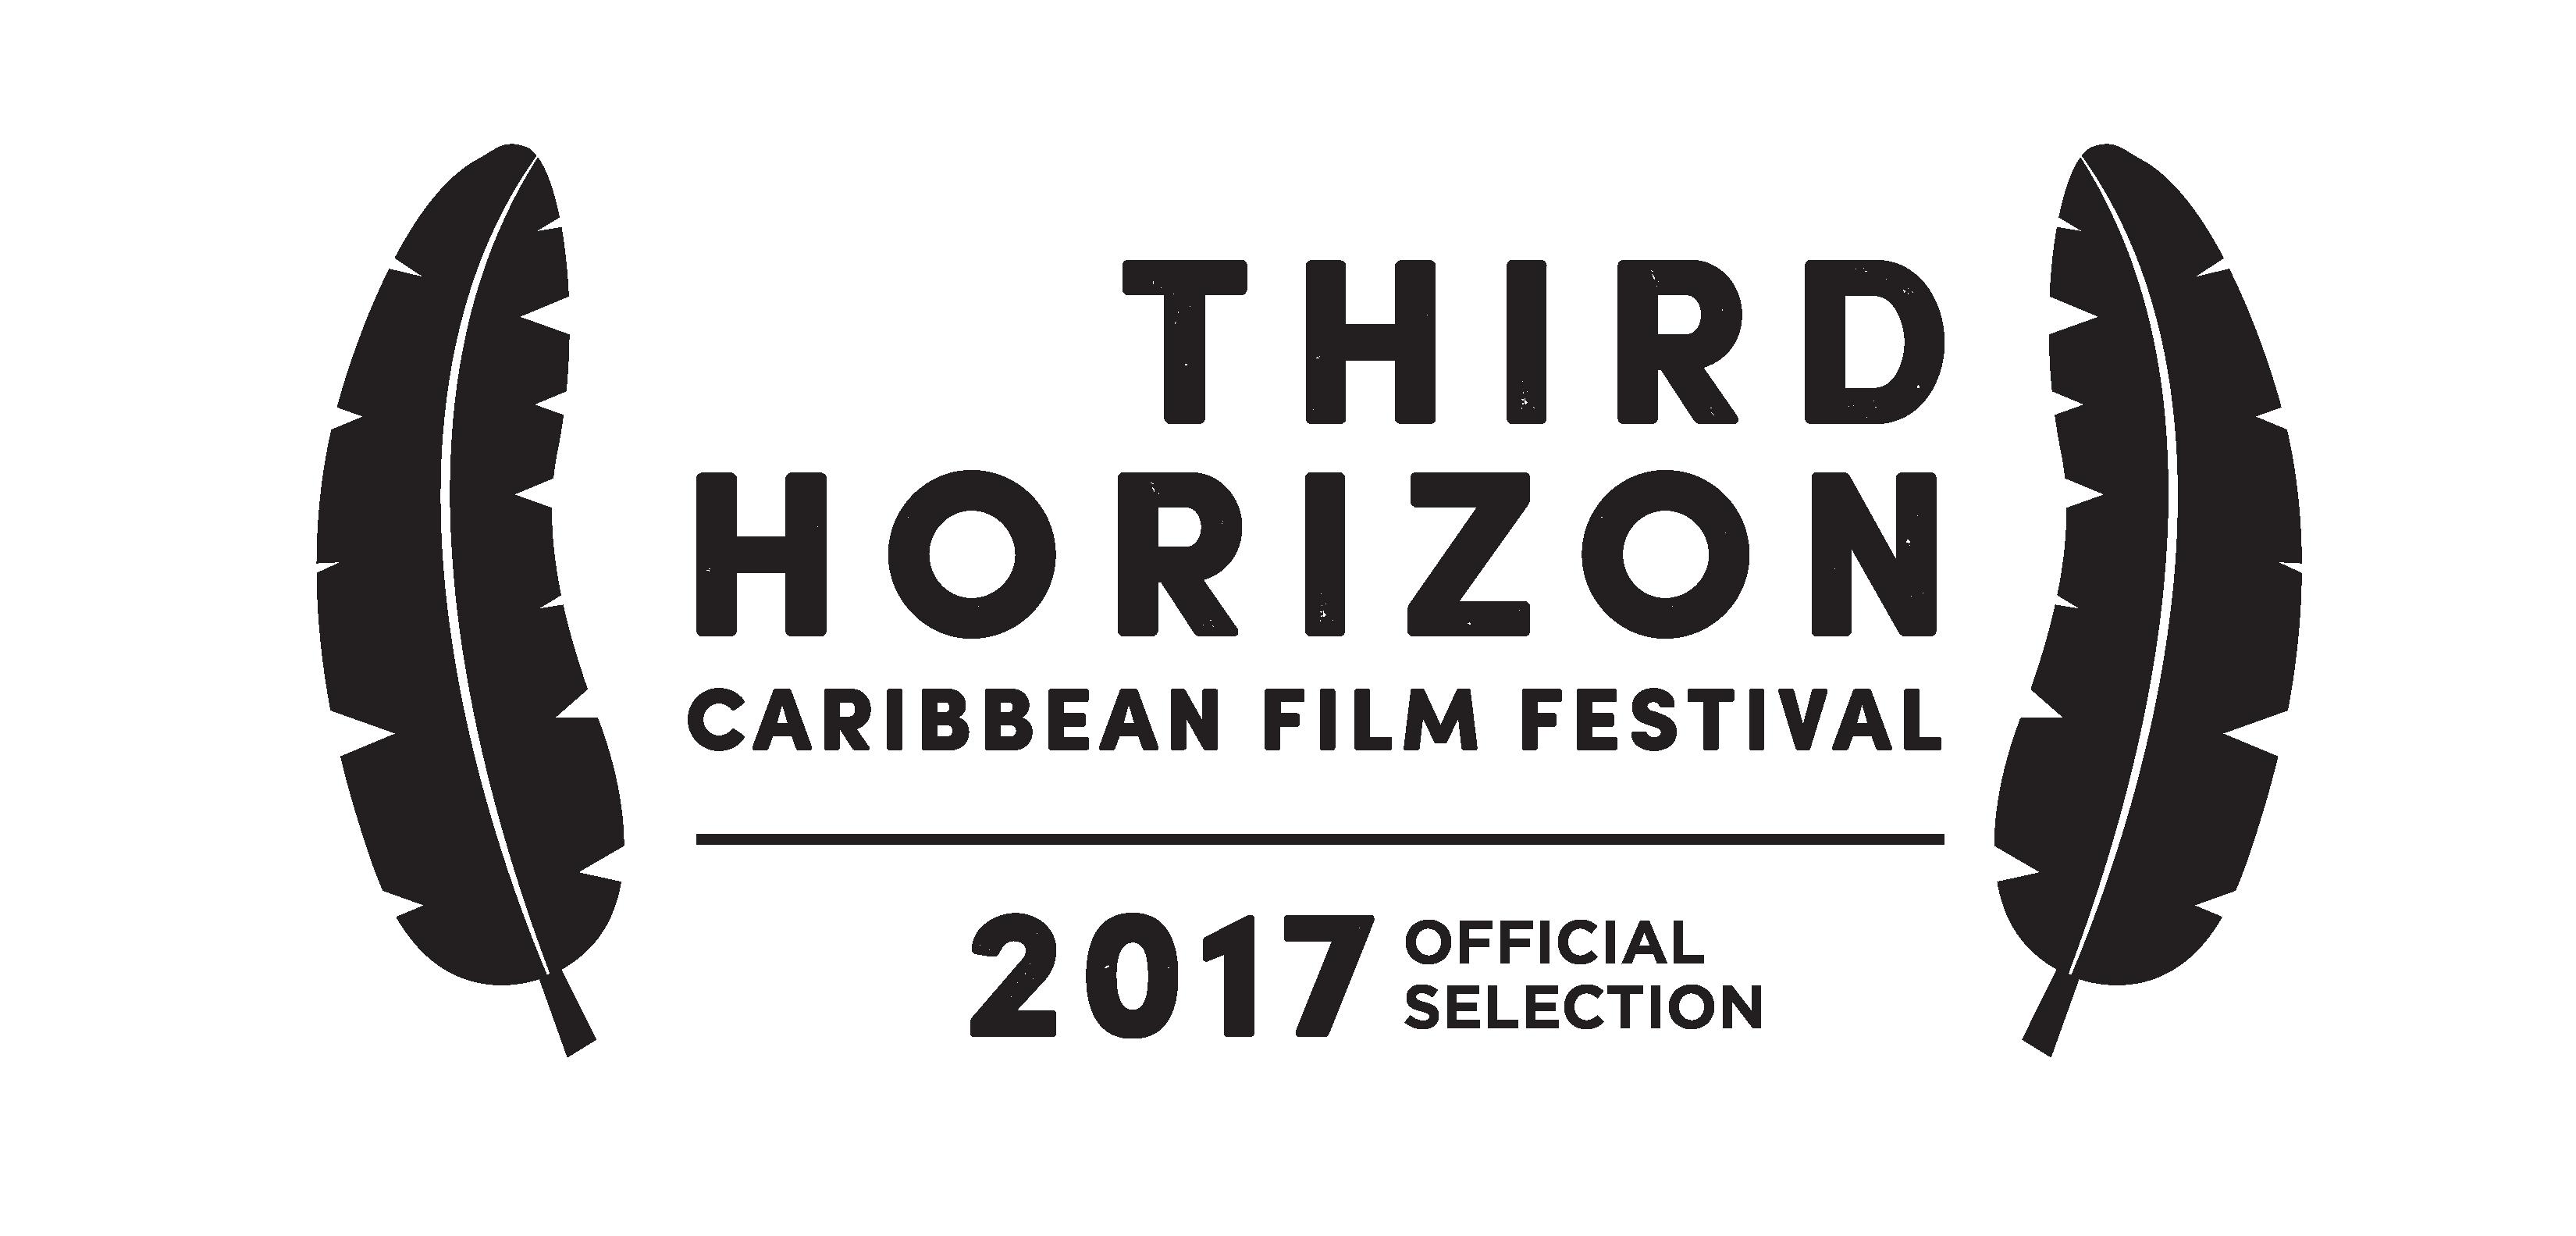 ThirdHorizon17_laurel-black